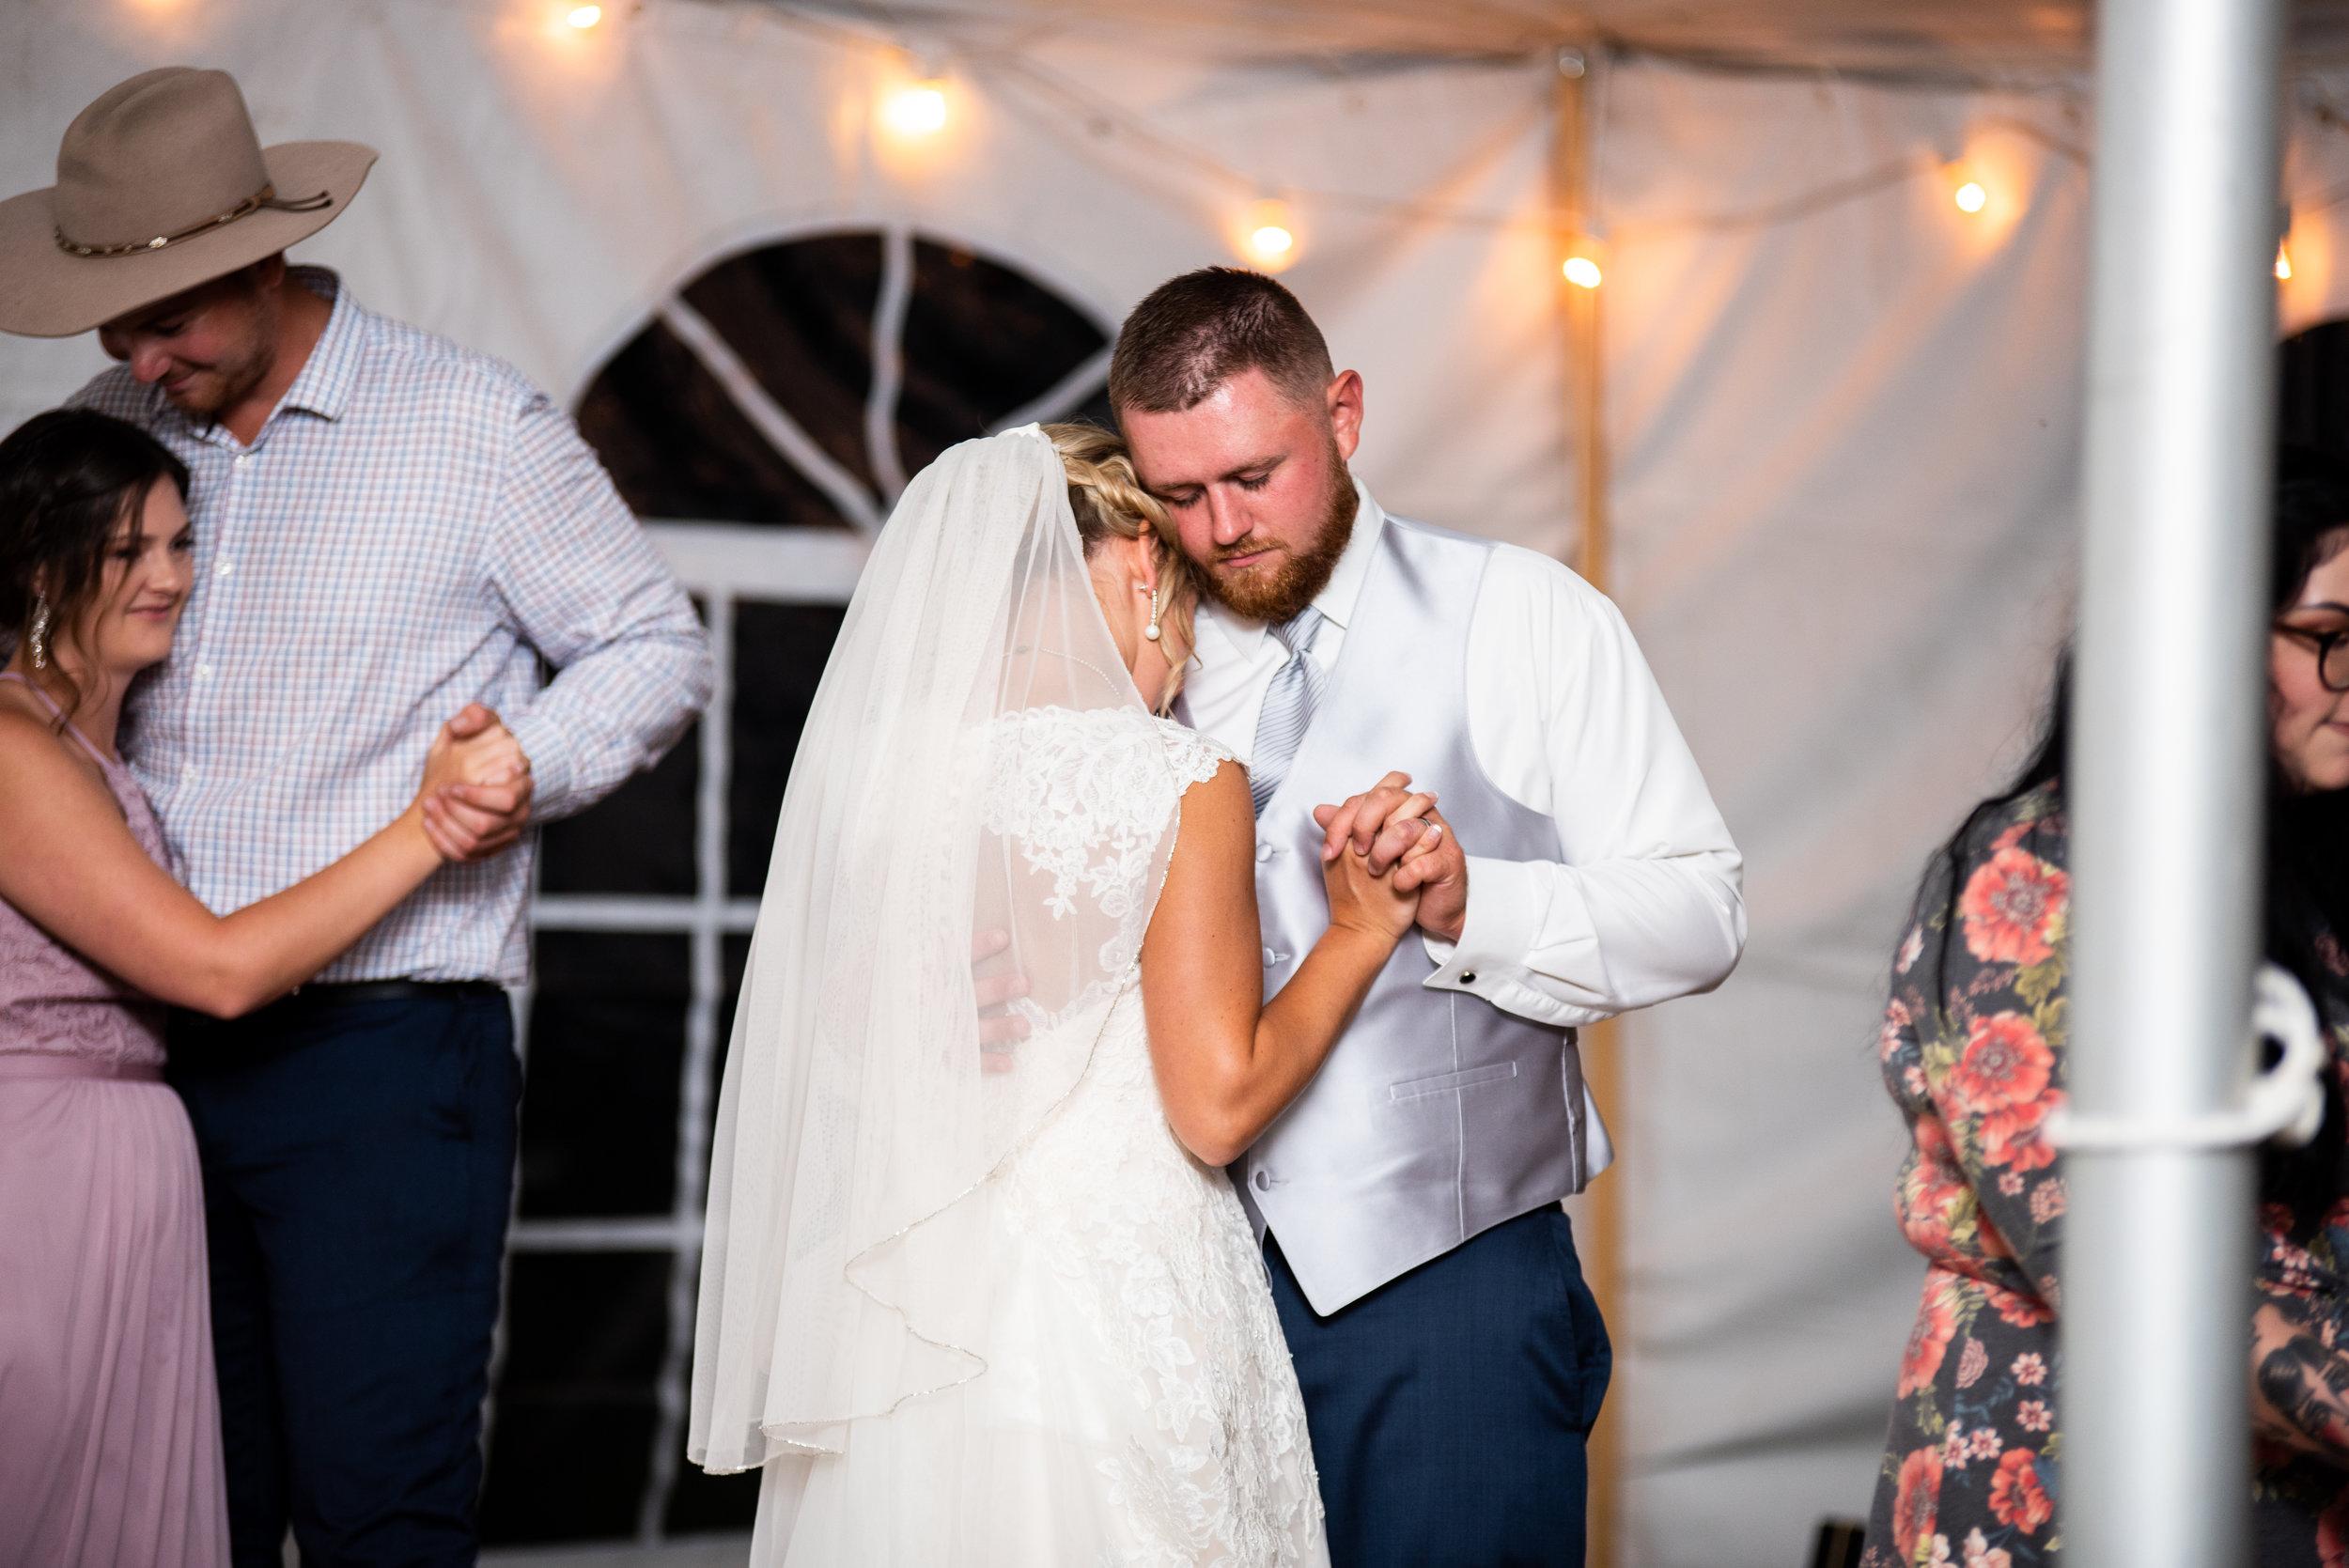 wedding (1 of 1)-226.jpg